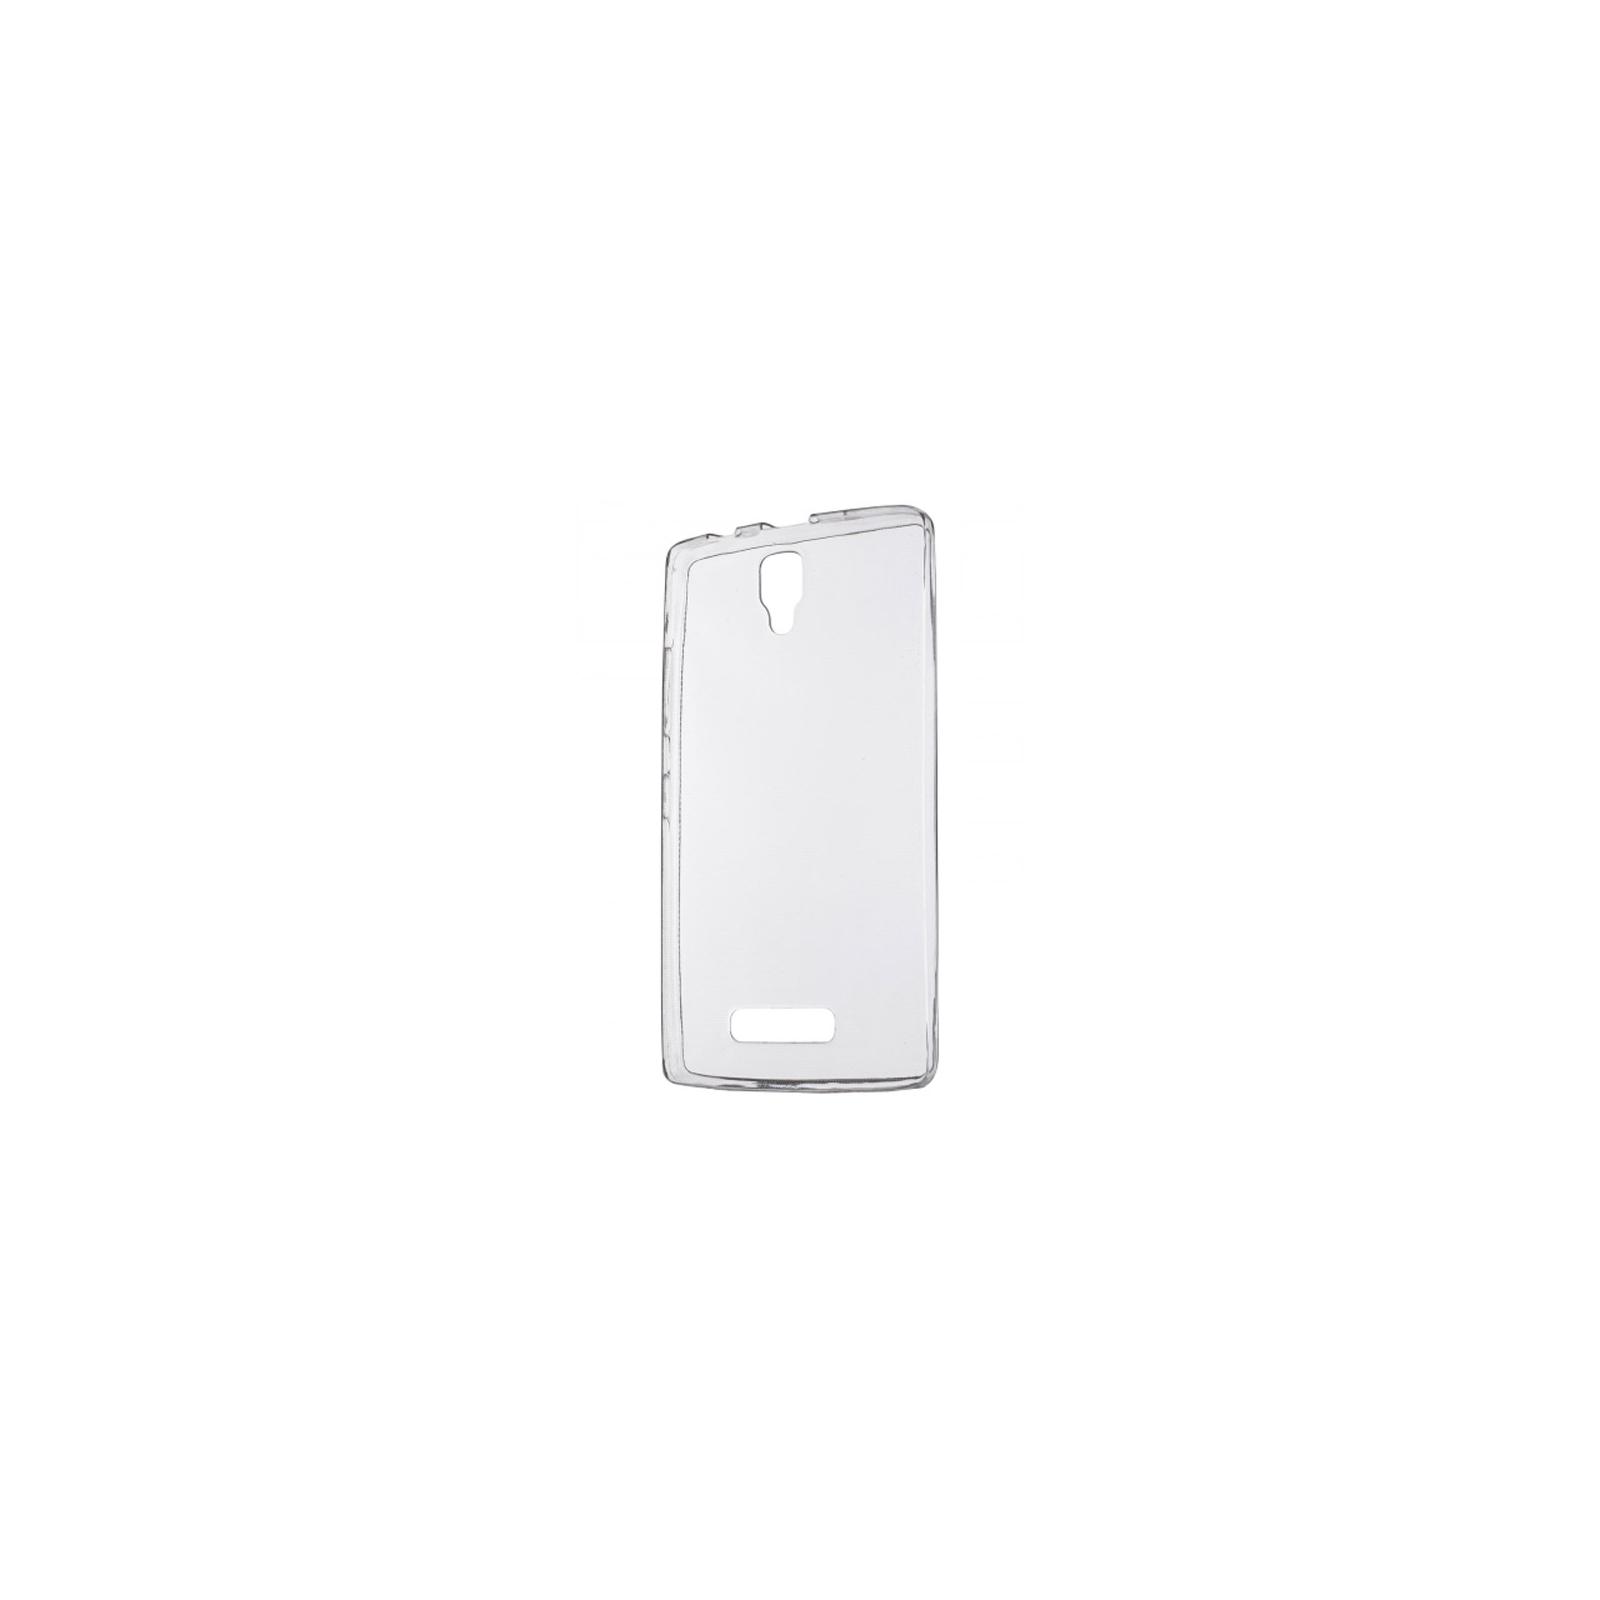 Чехол для моб. телефона Drobak для Lenovo A2010 (Clear) (219207)